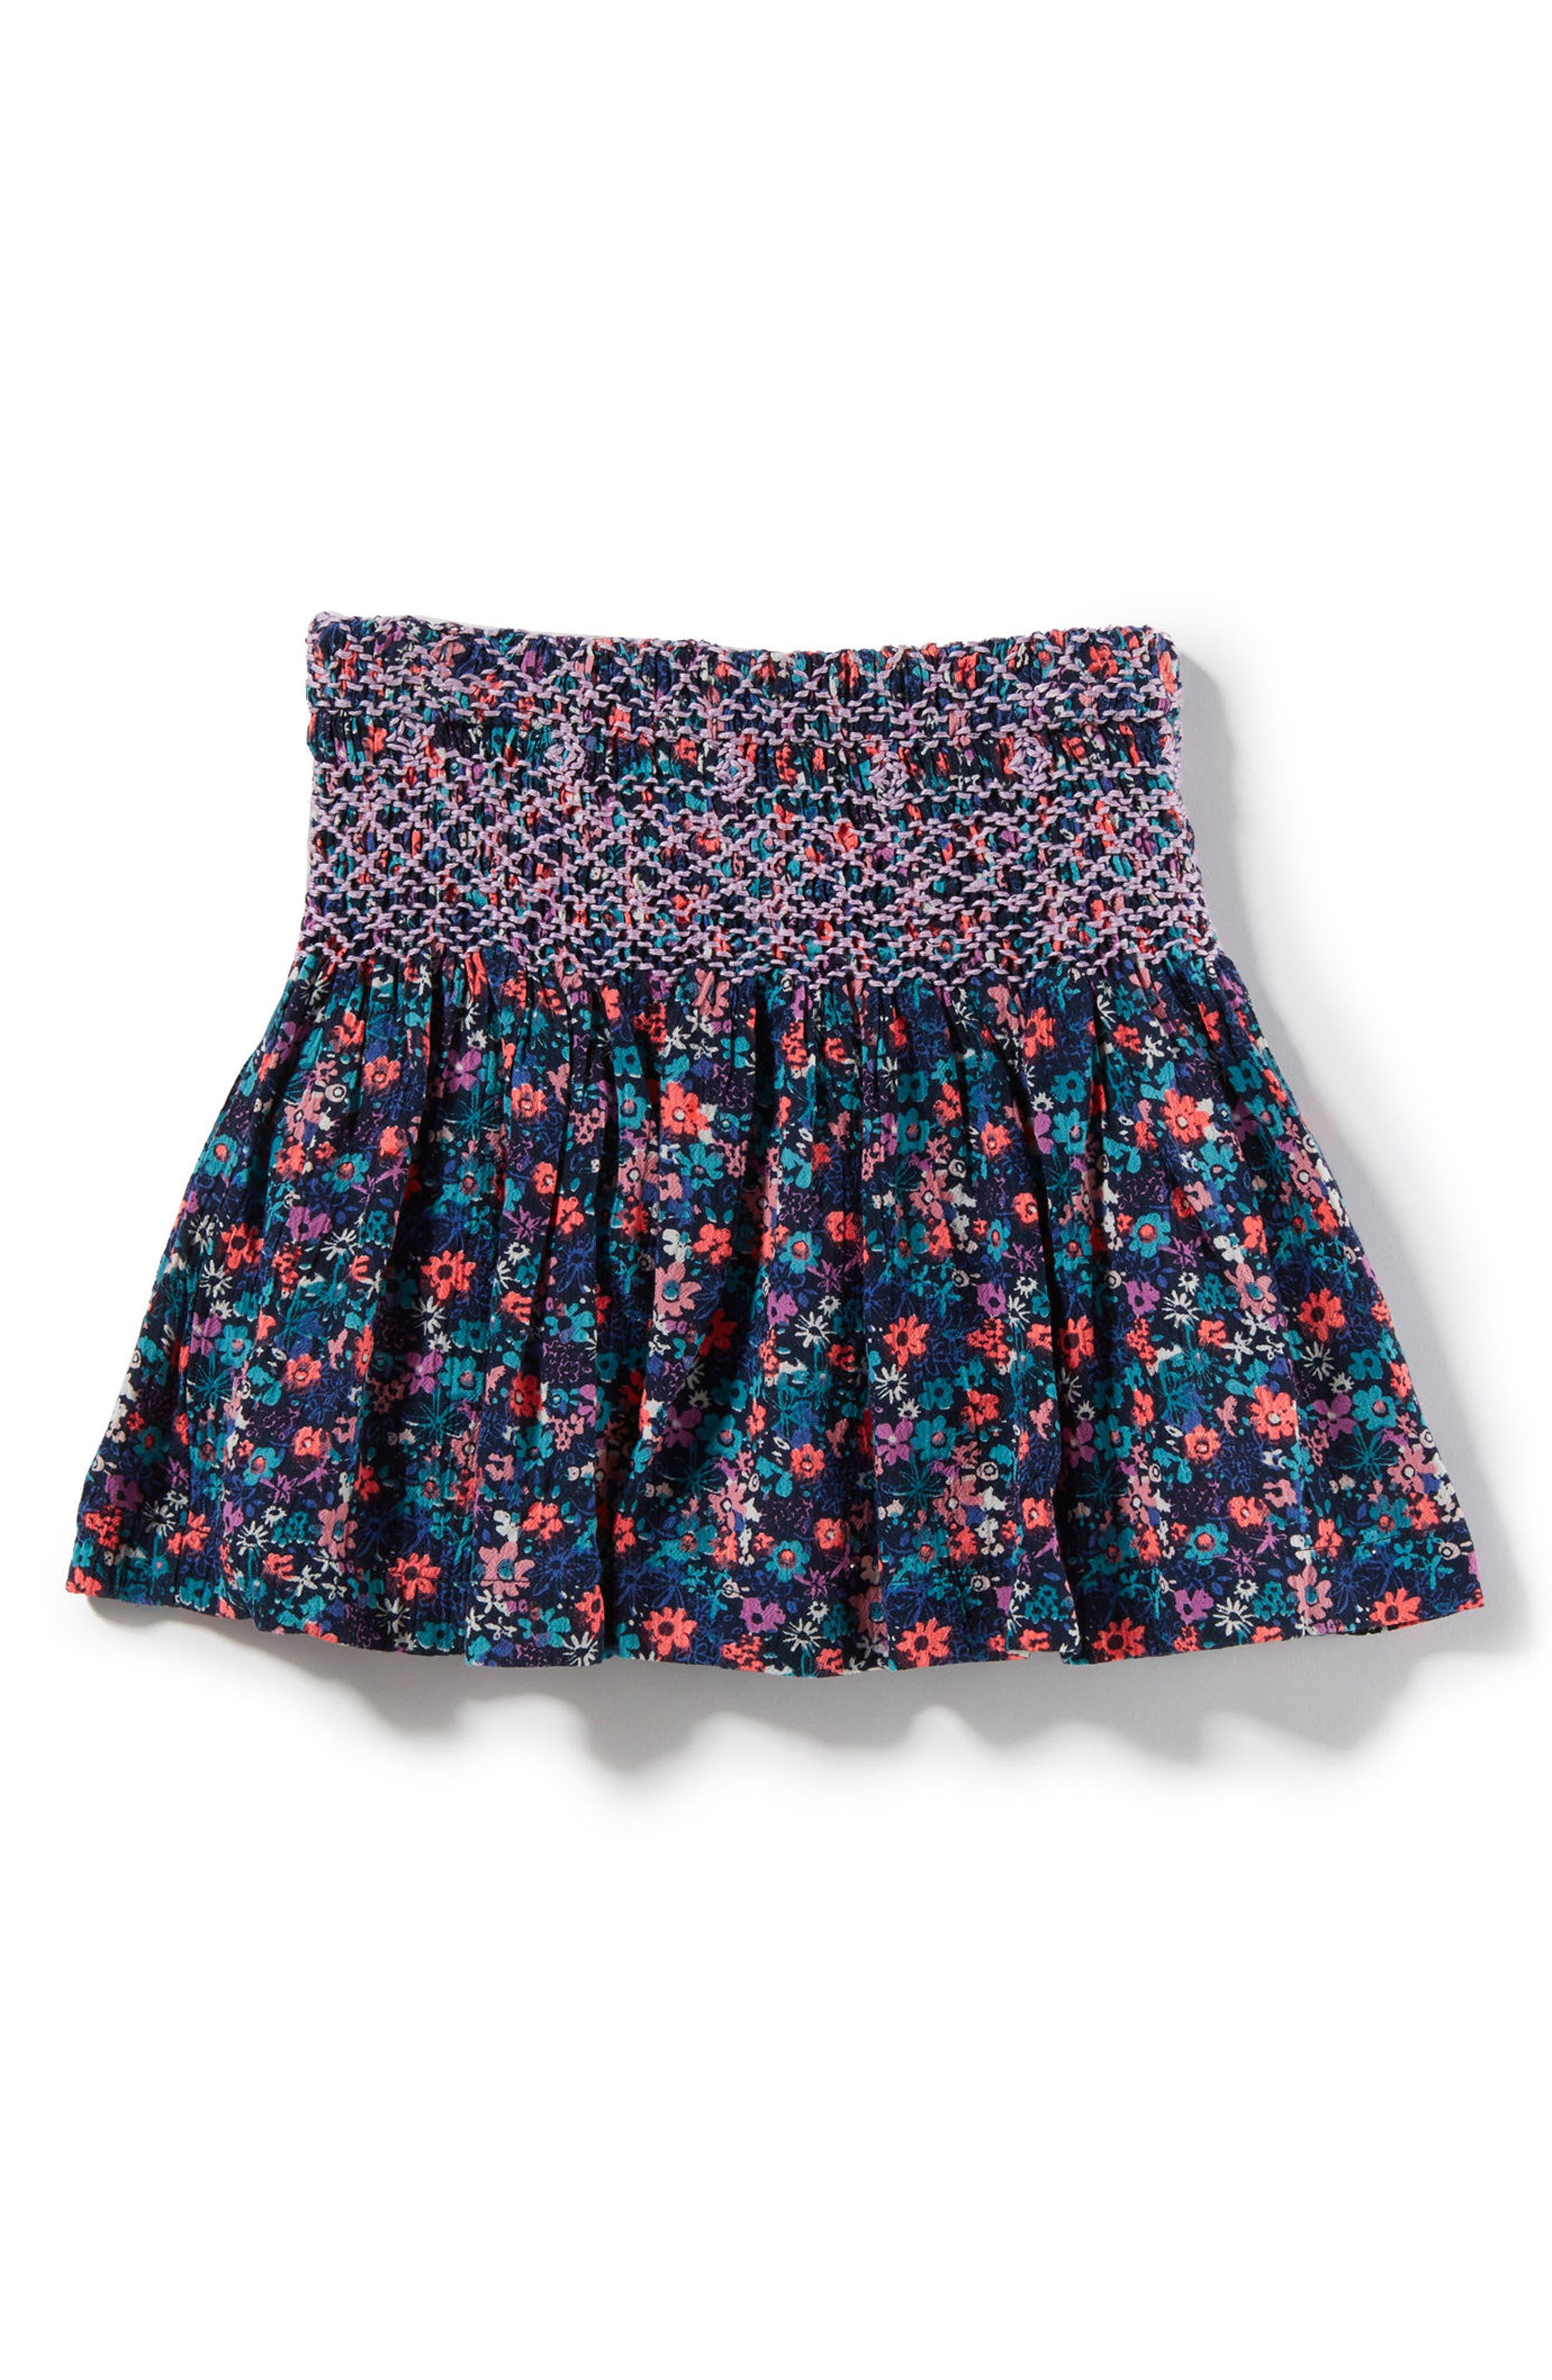 Main Image - Peek Pixie Smock Skirt (Toddler Girls, Little Girls & Big Girls)